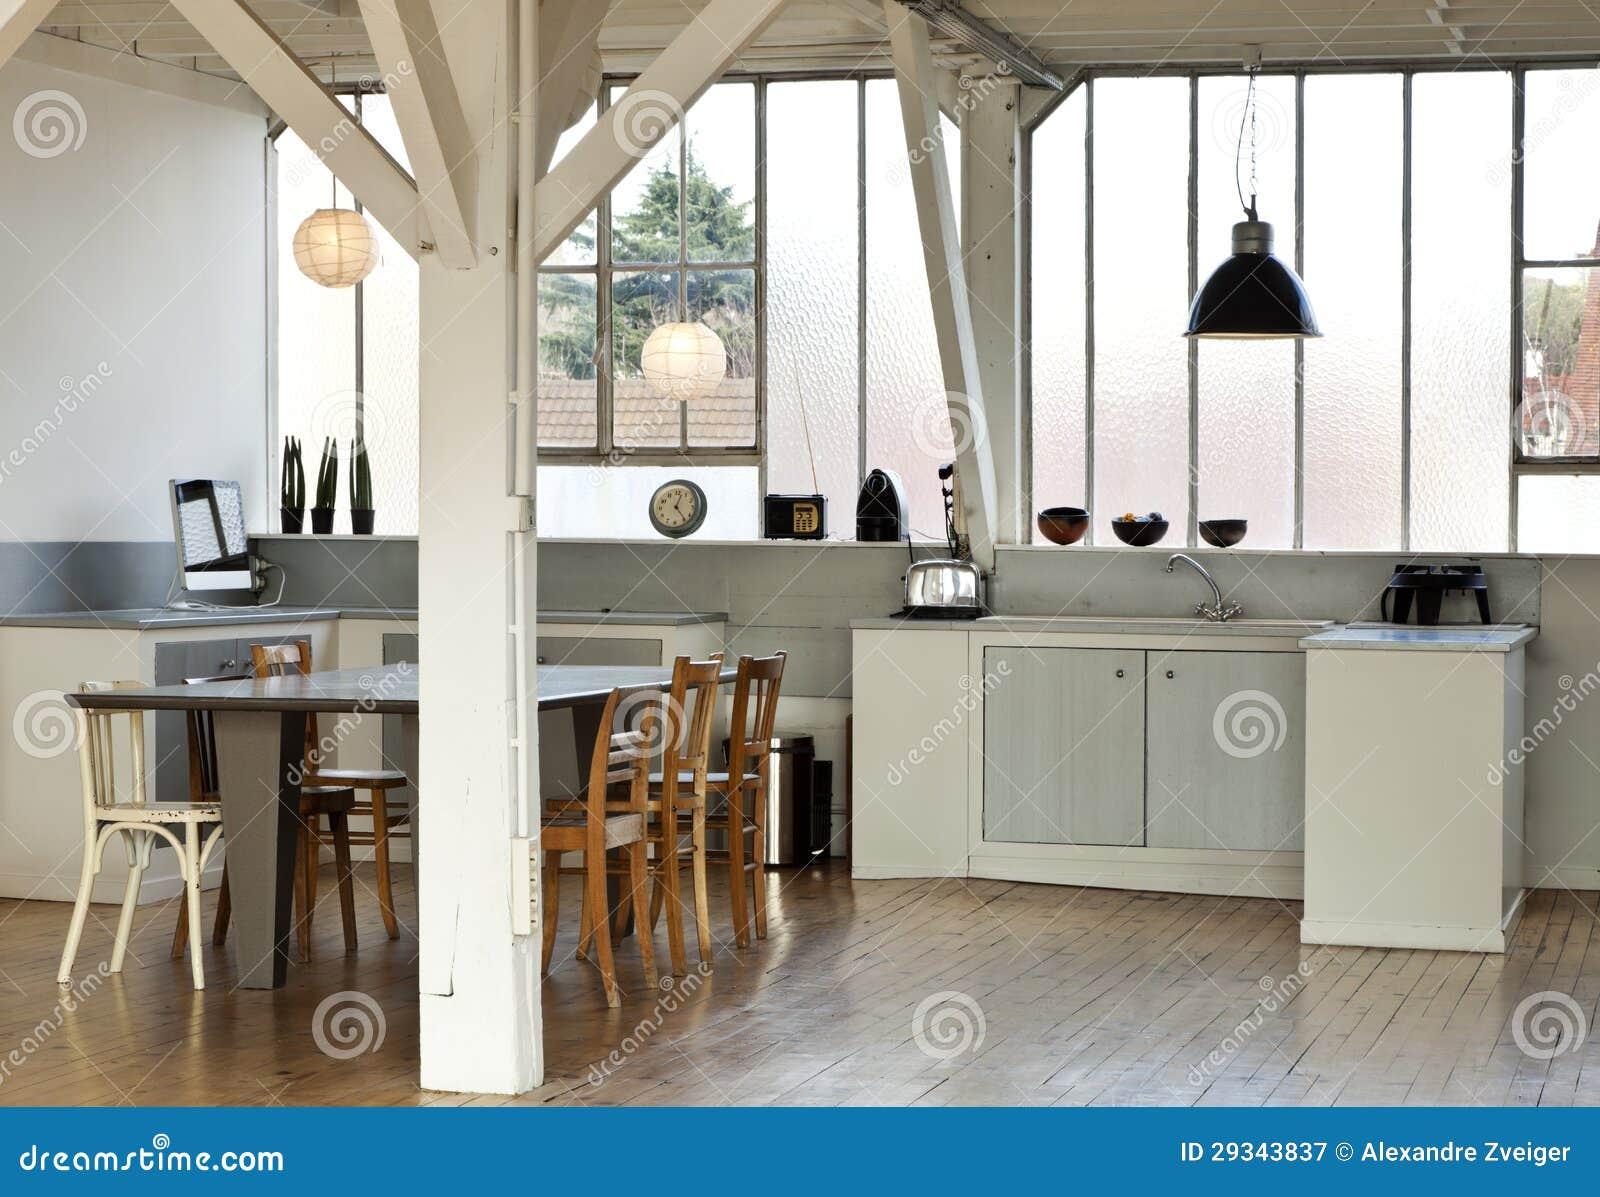 Image Result For Urban Loft Interior Design Ideas